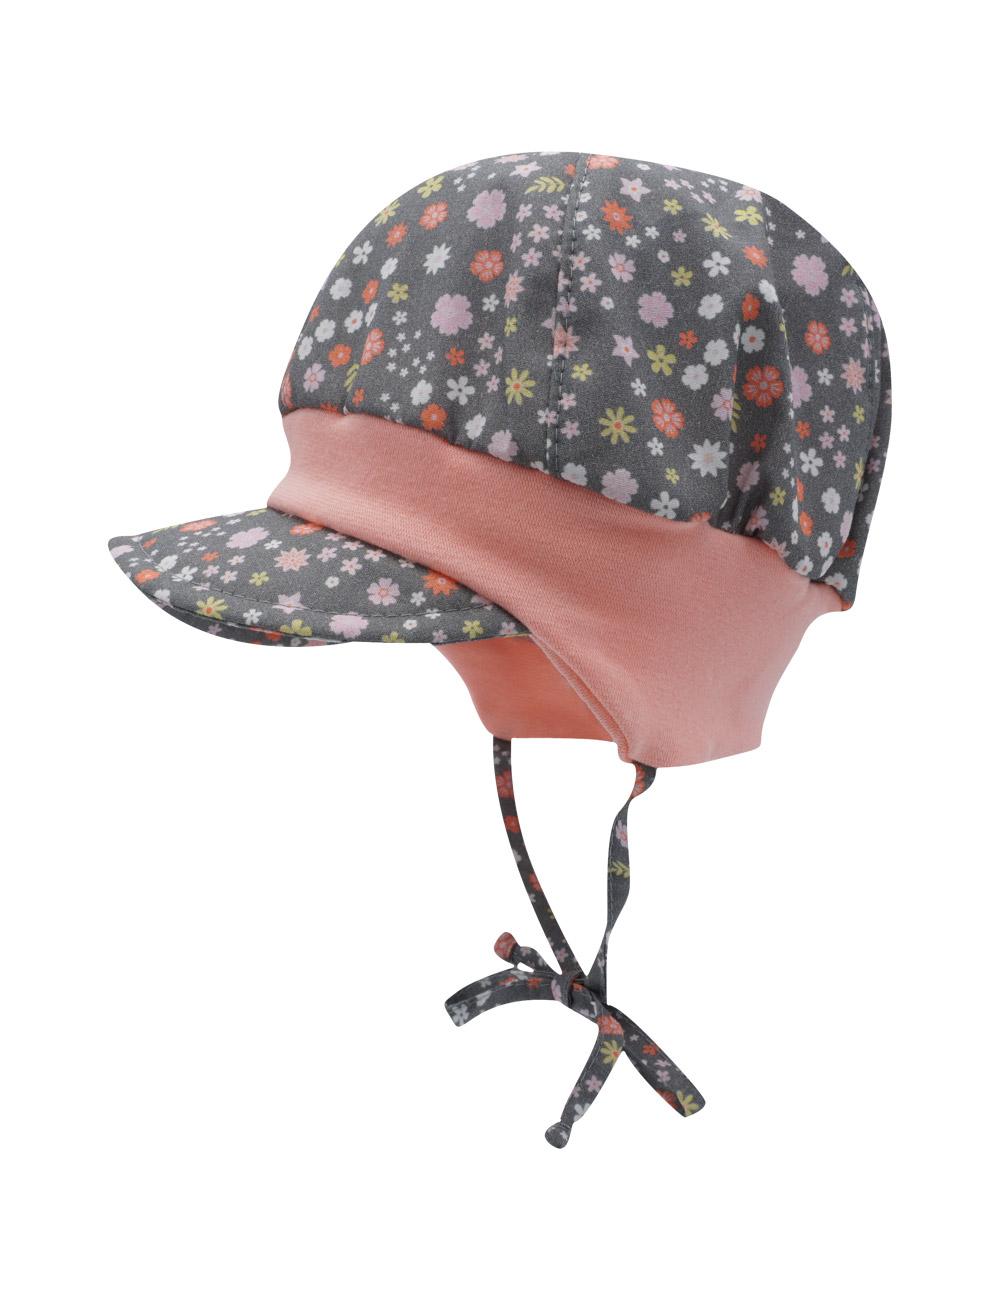 GIRL-Schildmütze 41 Maximo. Farbe: holzkohle-rosa-blümchen, Größe: 41